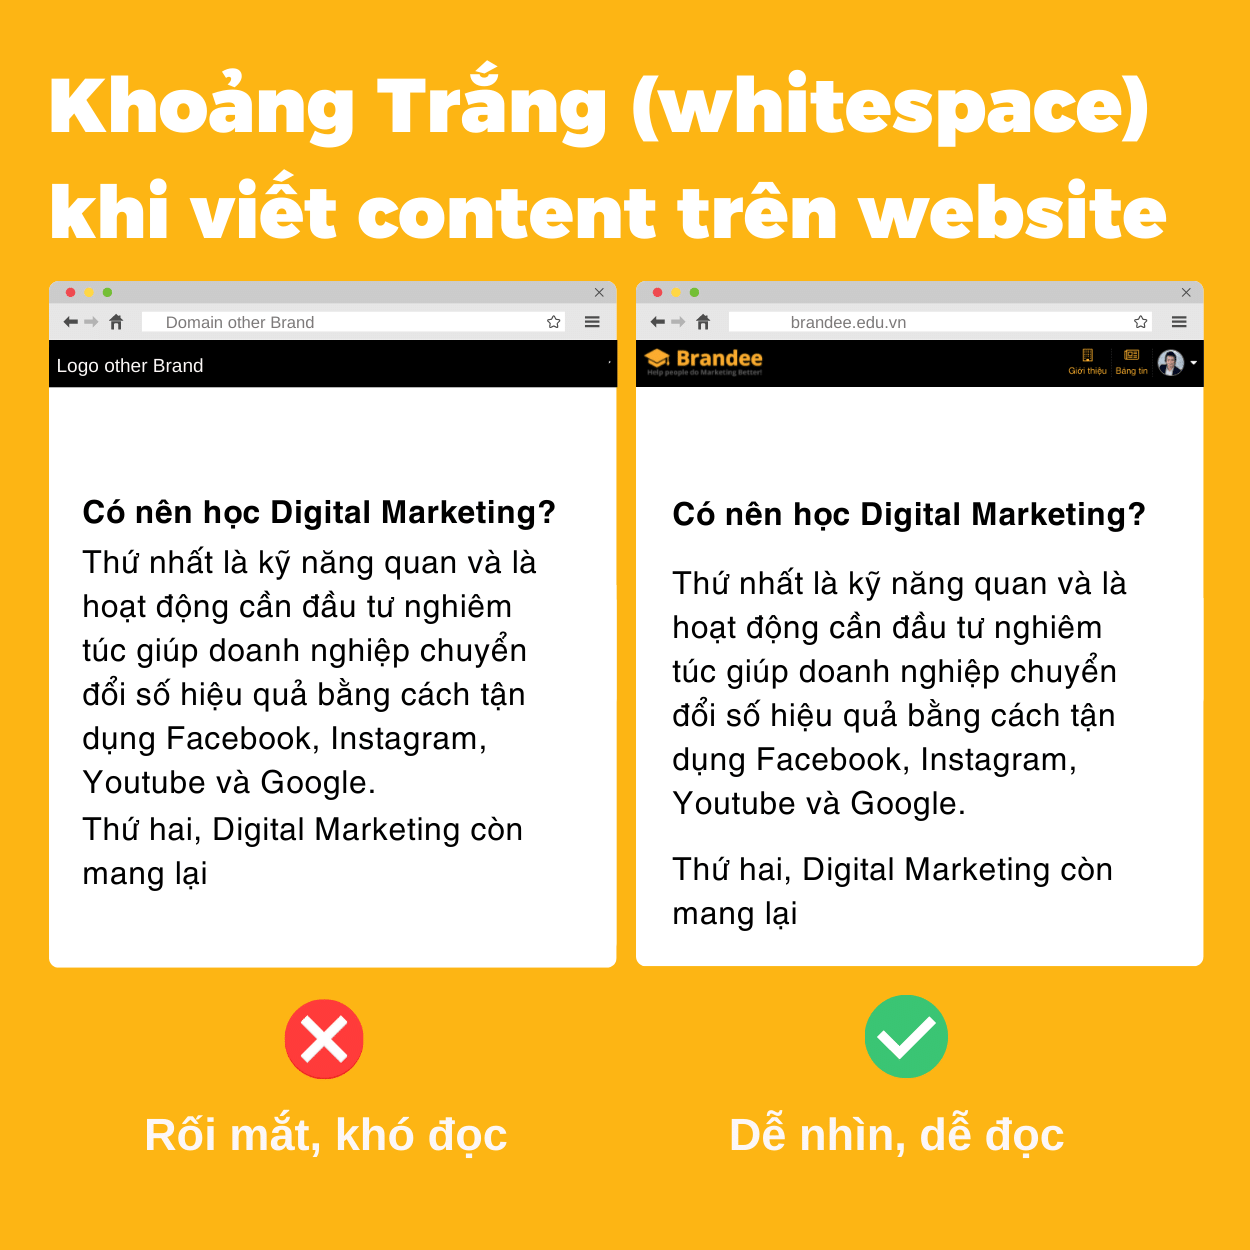 Khoảng Trắng (whitespace) khi viết content trên website